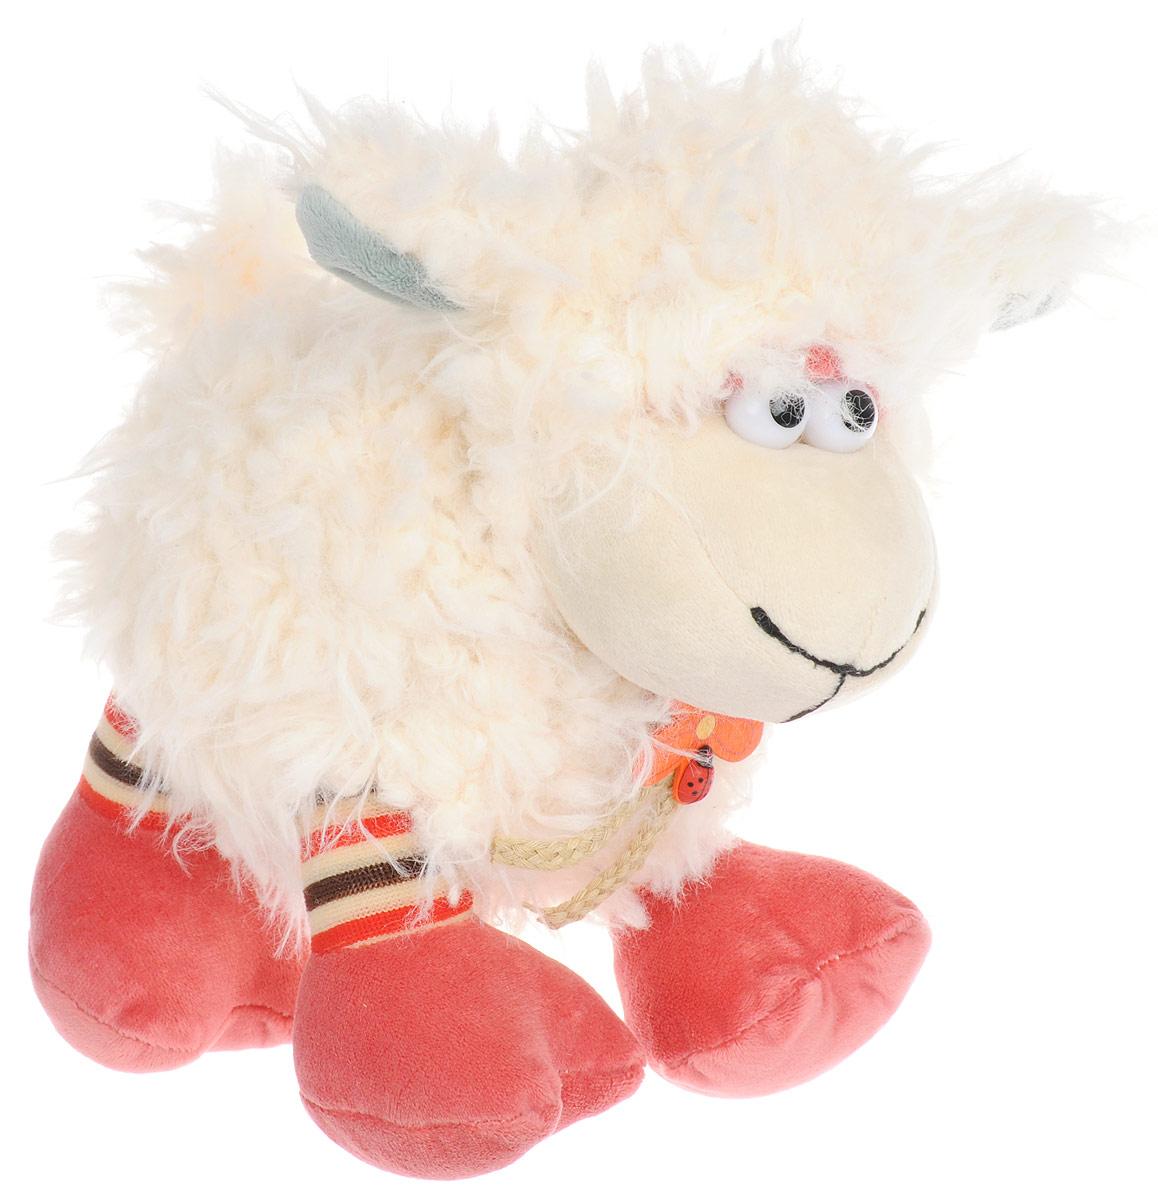 Jackie Chinoco Мягкая игрушка Овечка 21 см малышарики мягкая игрушка собака бассет хаунд 23 см